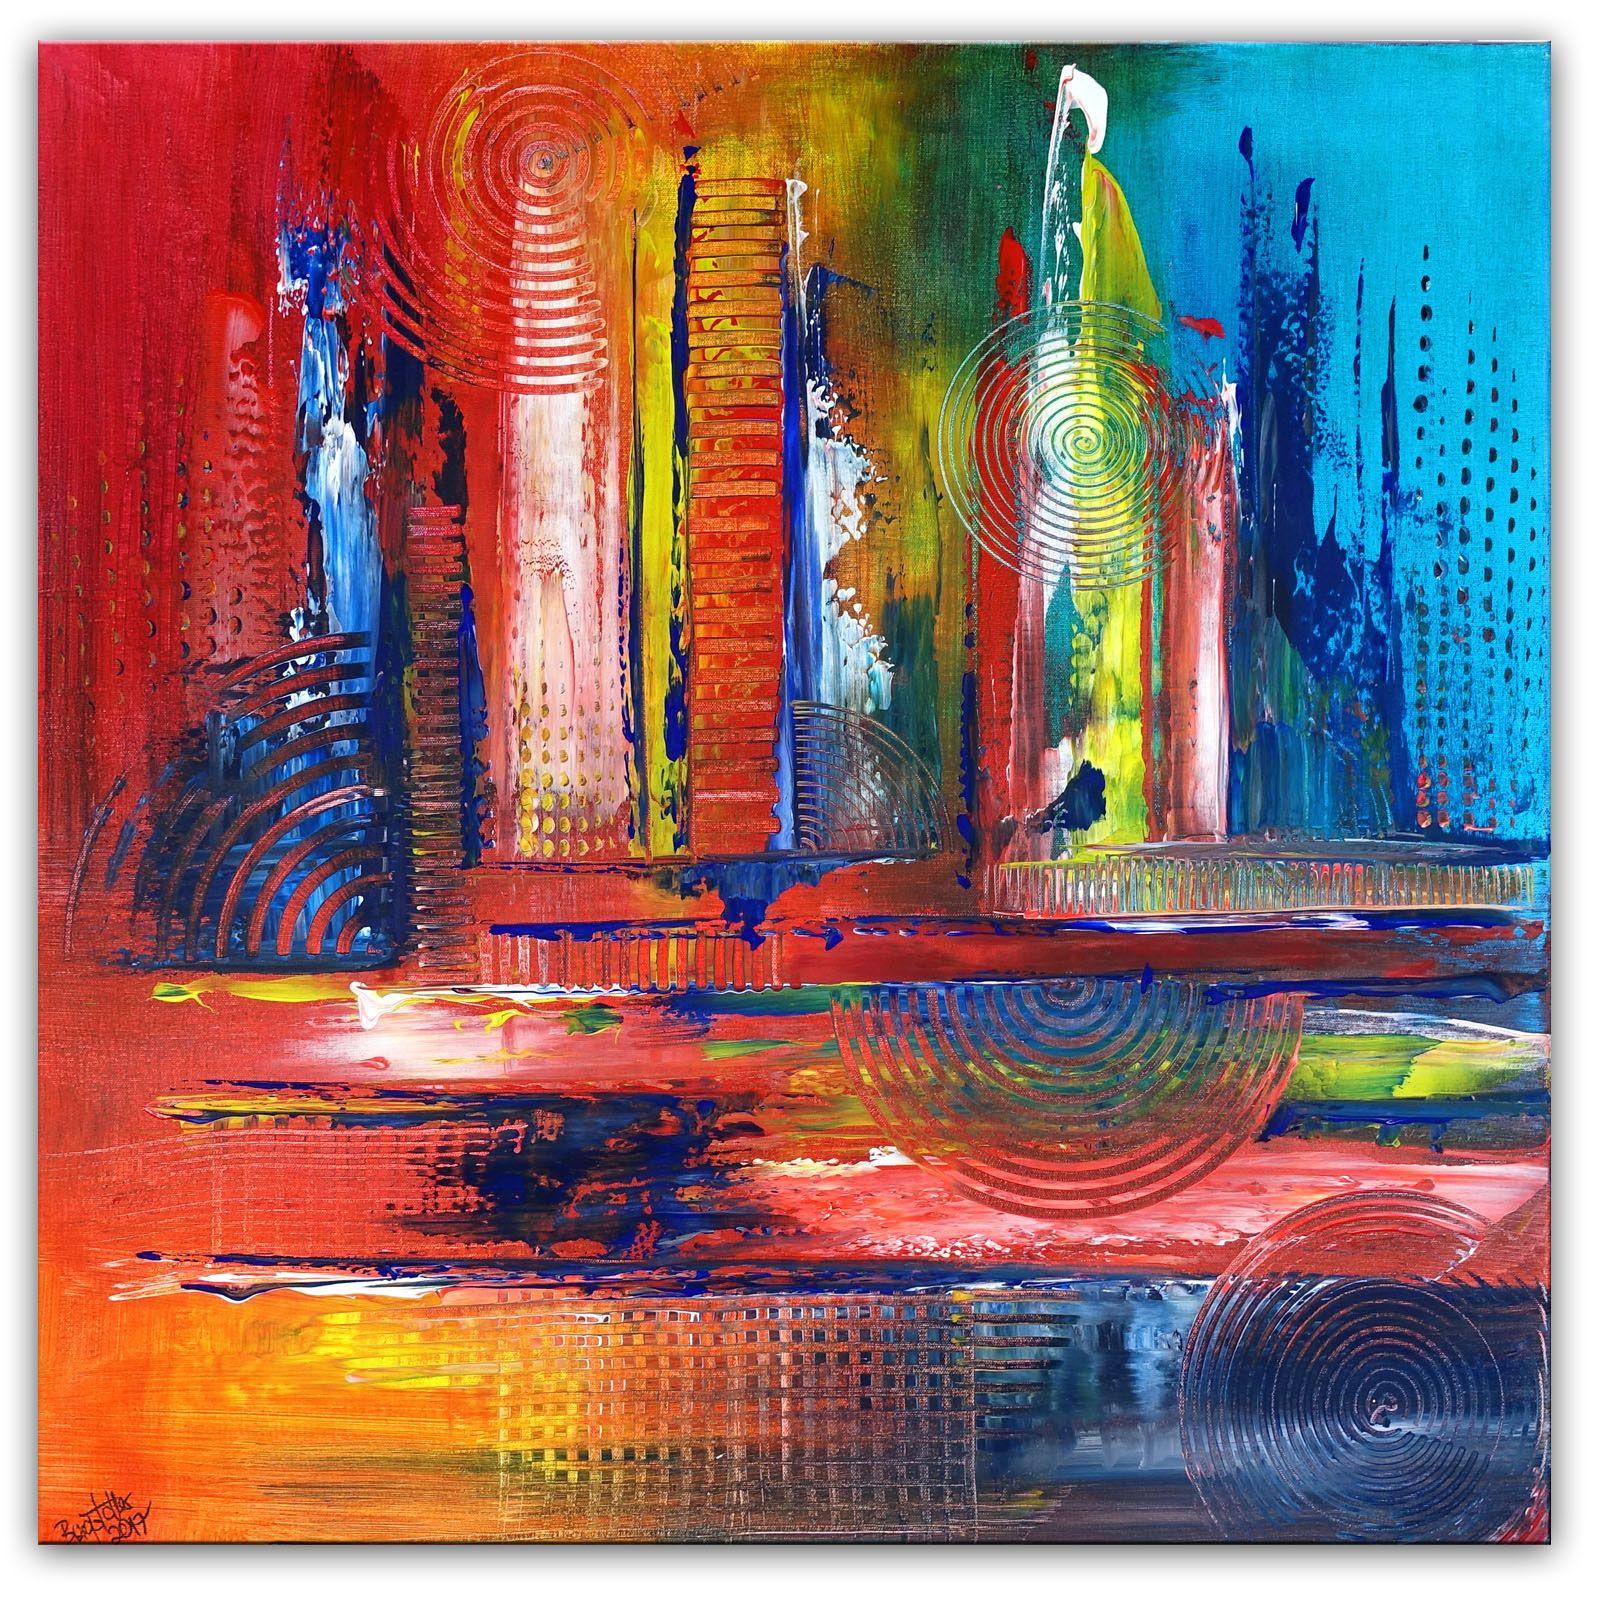 fluid art abstrakte kunst malerei grun rot gemalde acrylbilder abstrakt wandbild geometrische formen bilder acryl